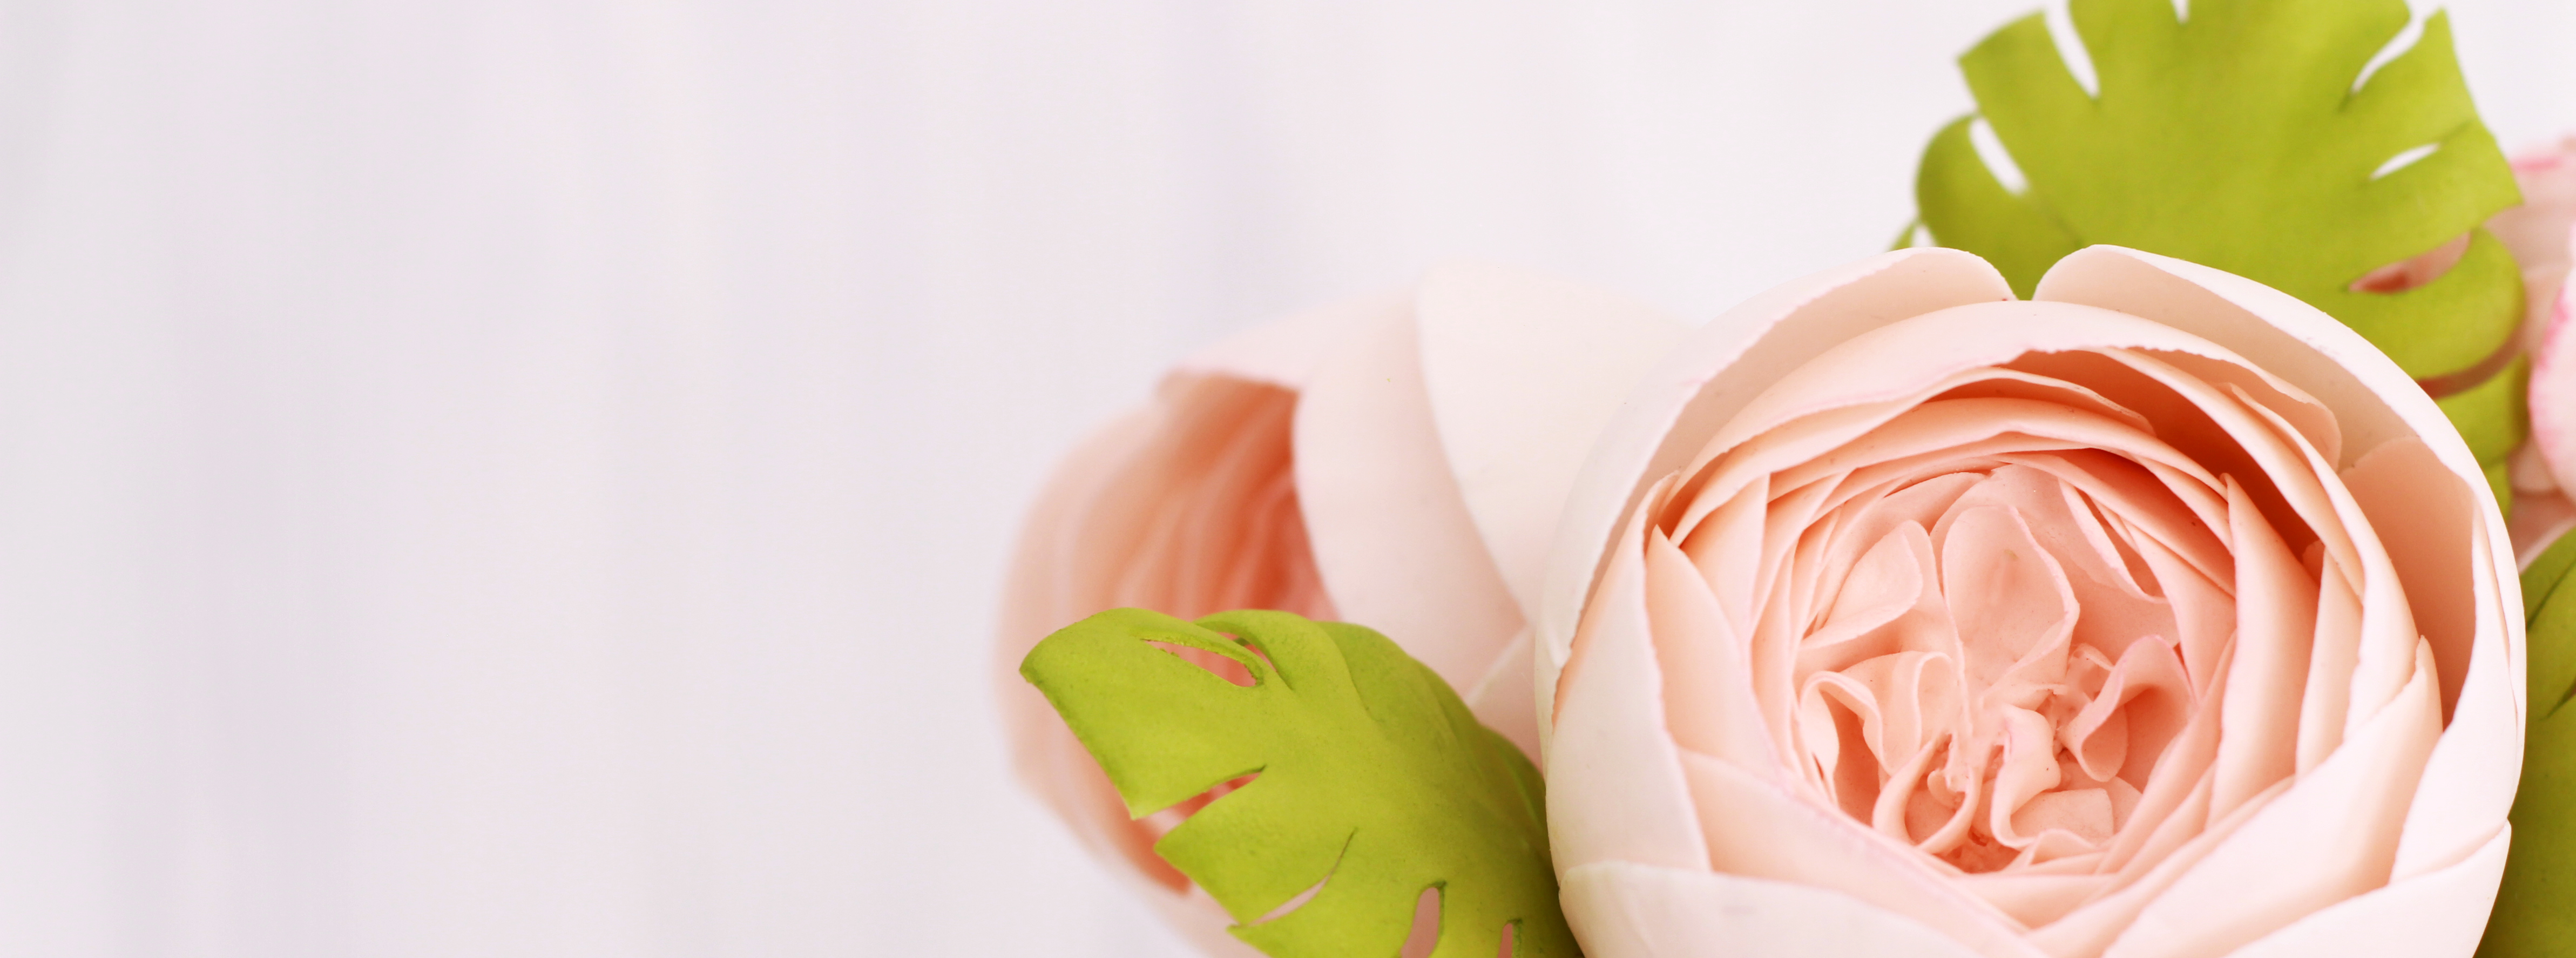 English roses close_WILY1300.jpg